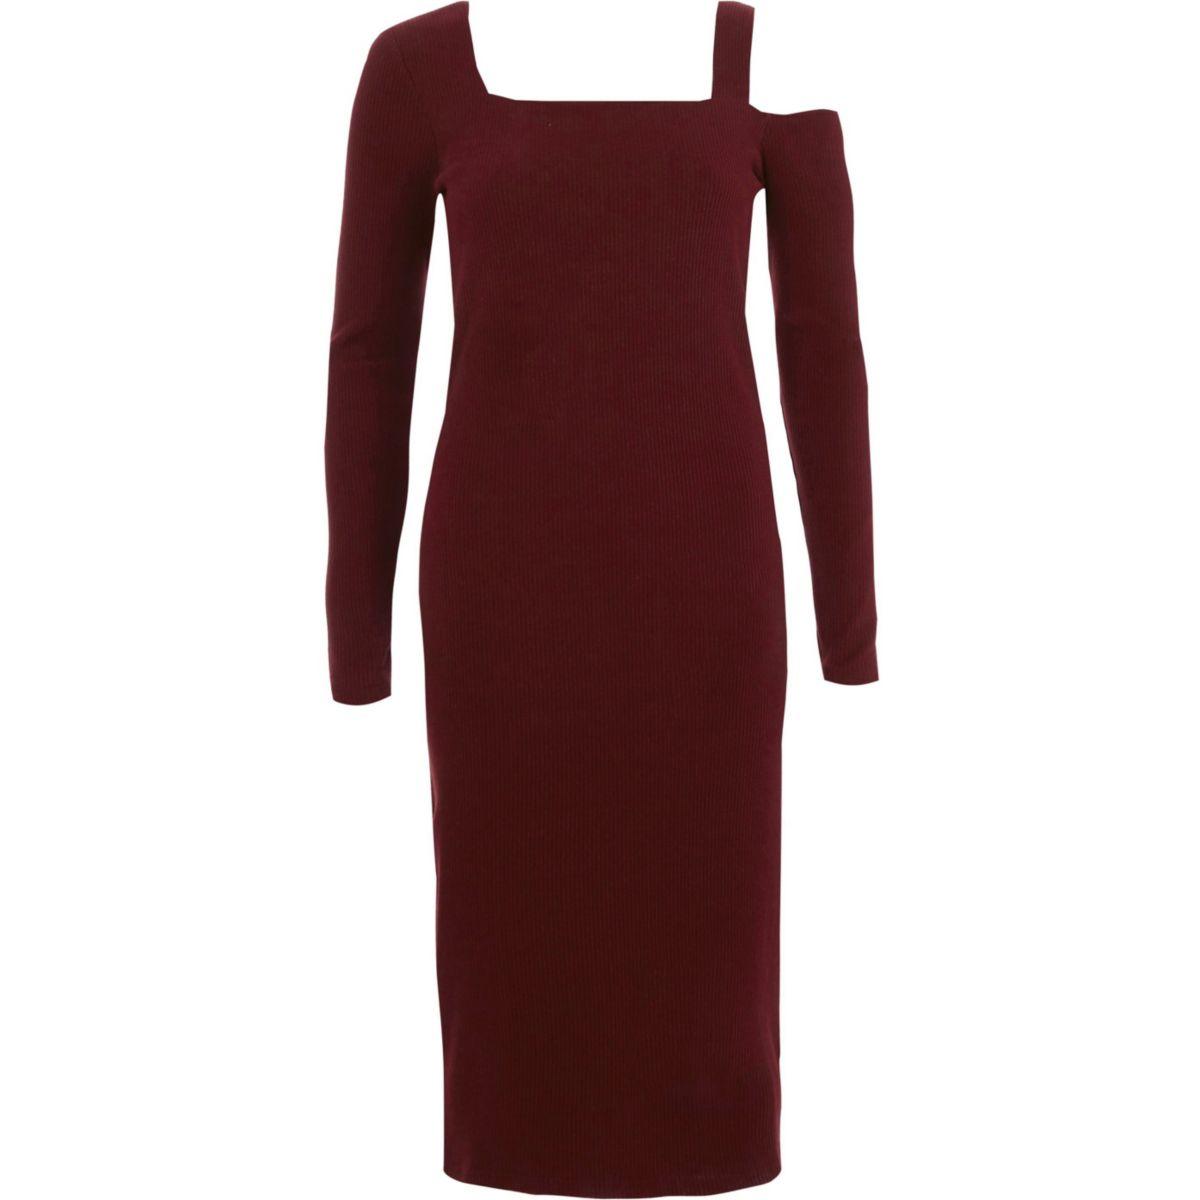 Burgundy ribbed square neck bodycon dress